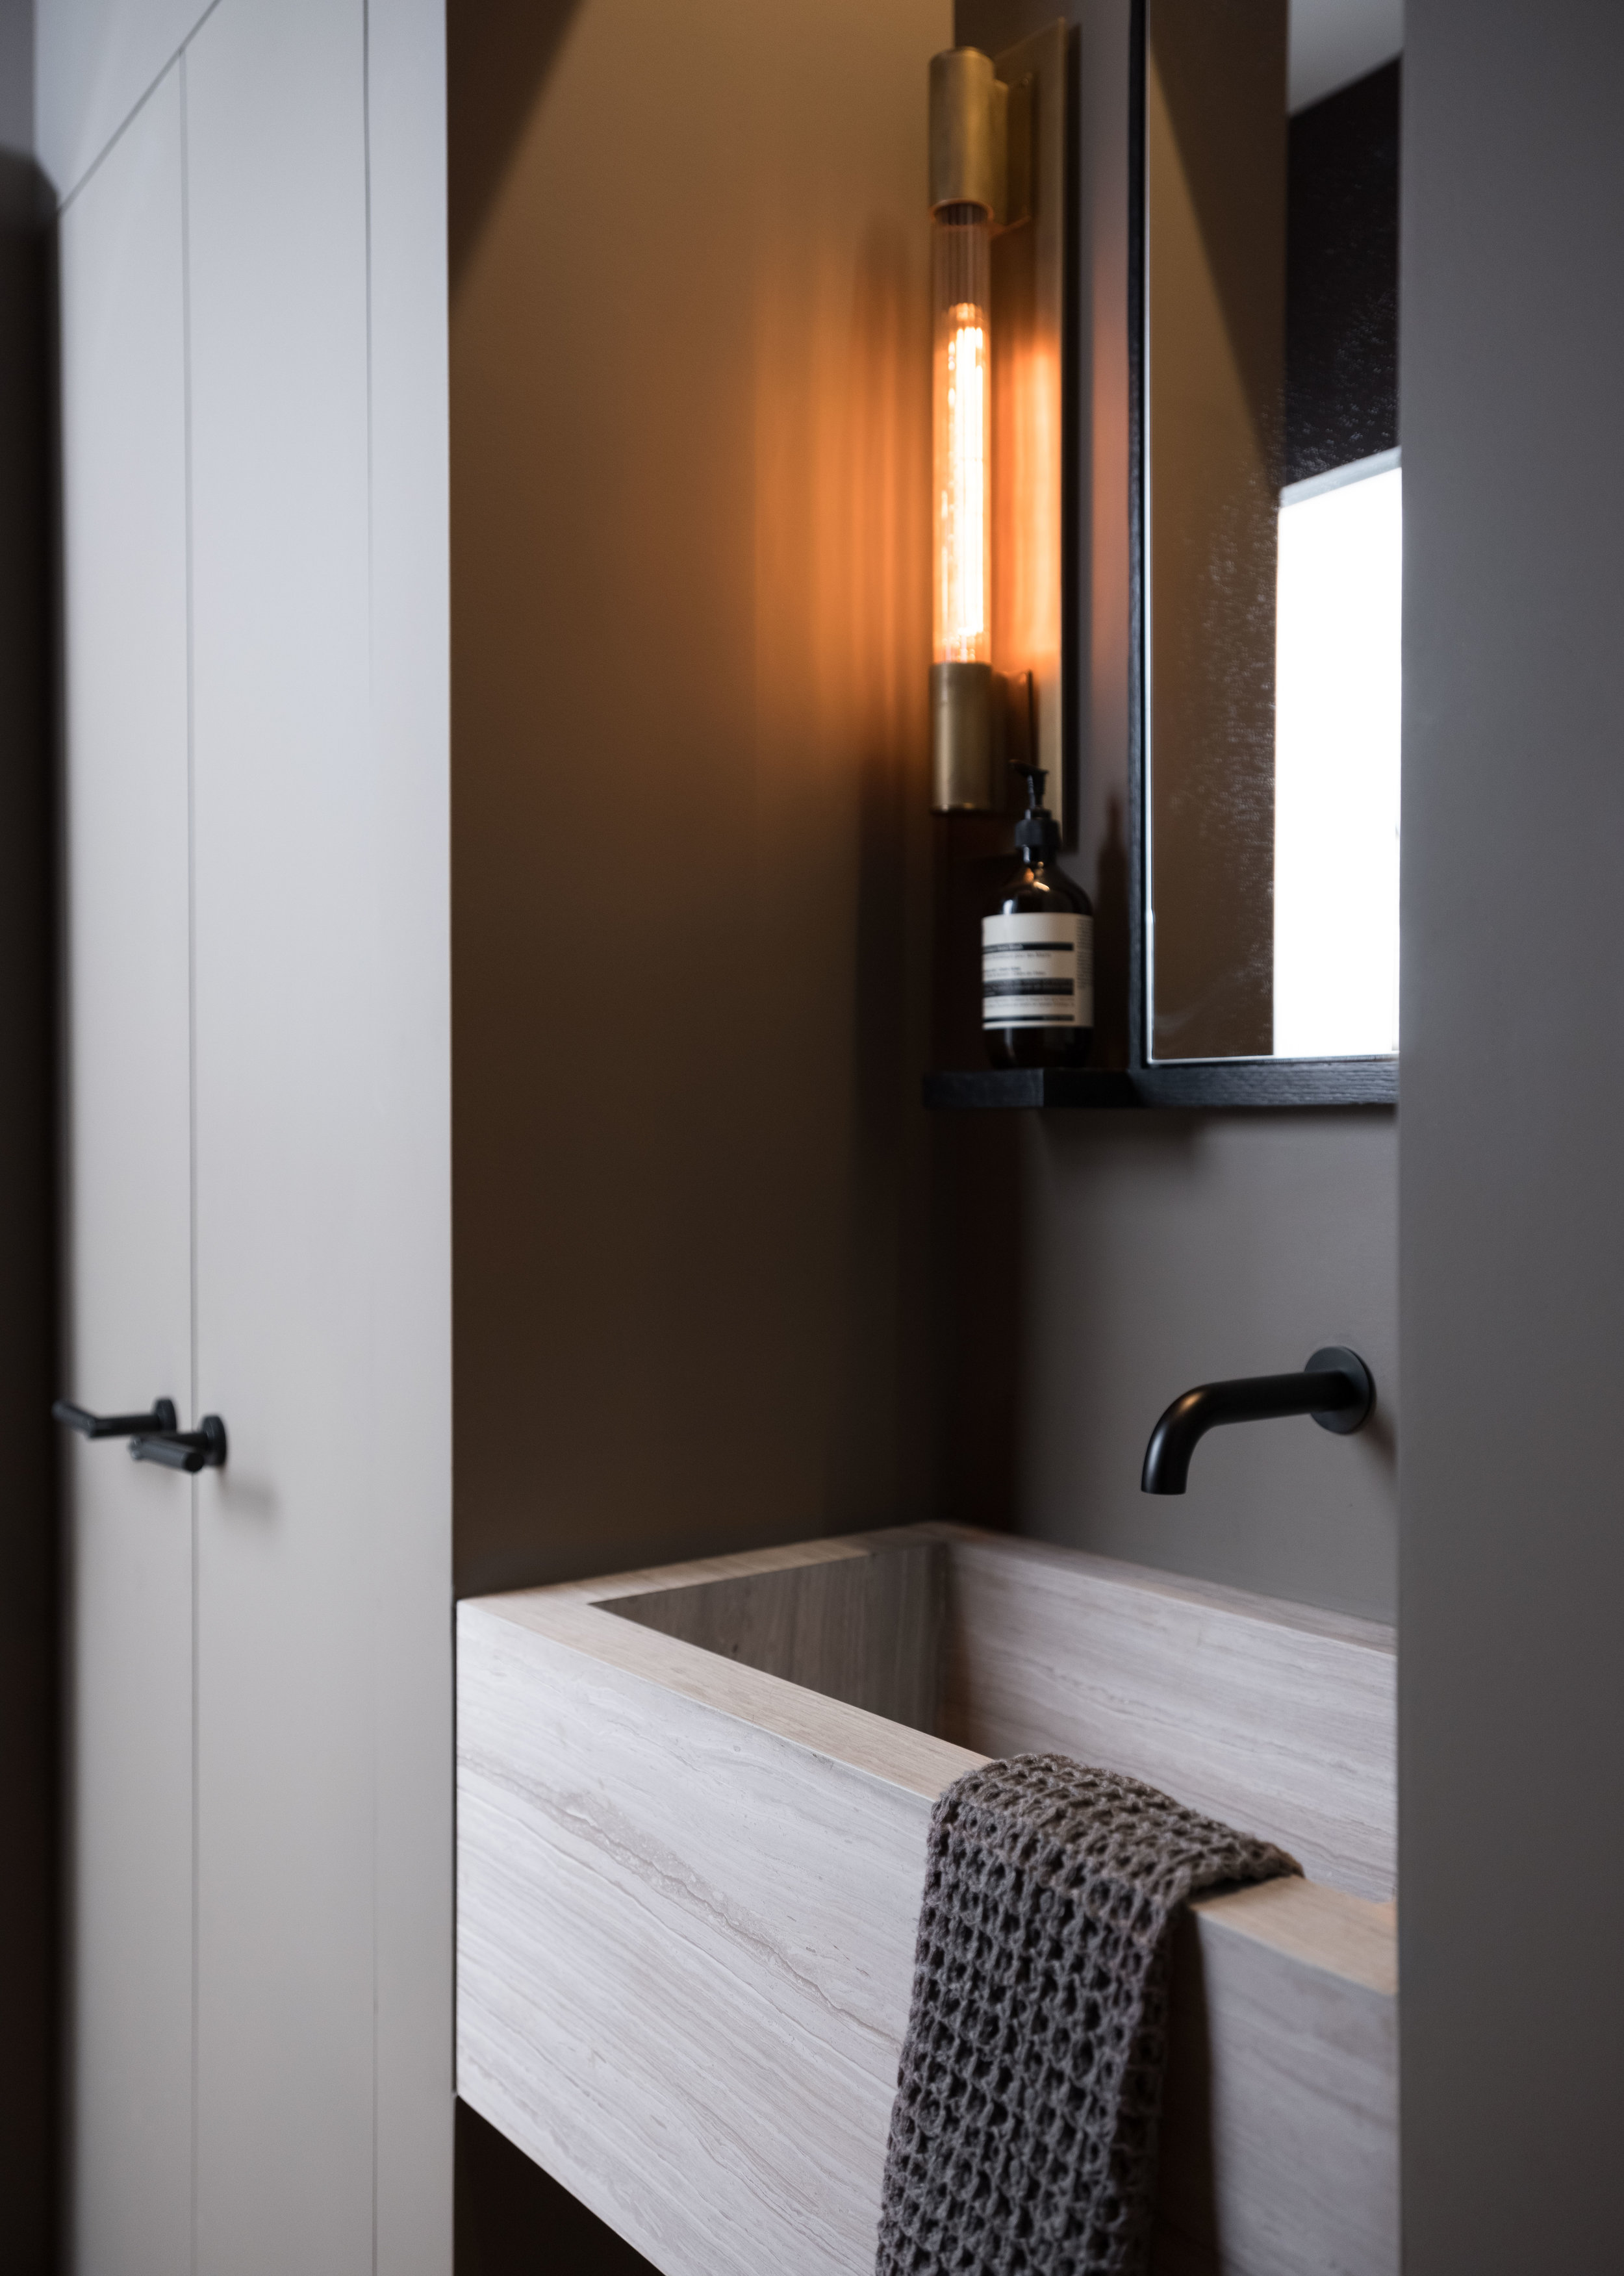 Mirror by Nafco  Materials: Ebonized oak & glass  Location: Powder Room,  Industrial Cast Iron Soho Loft